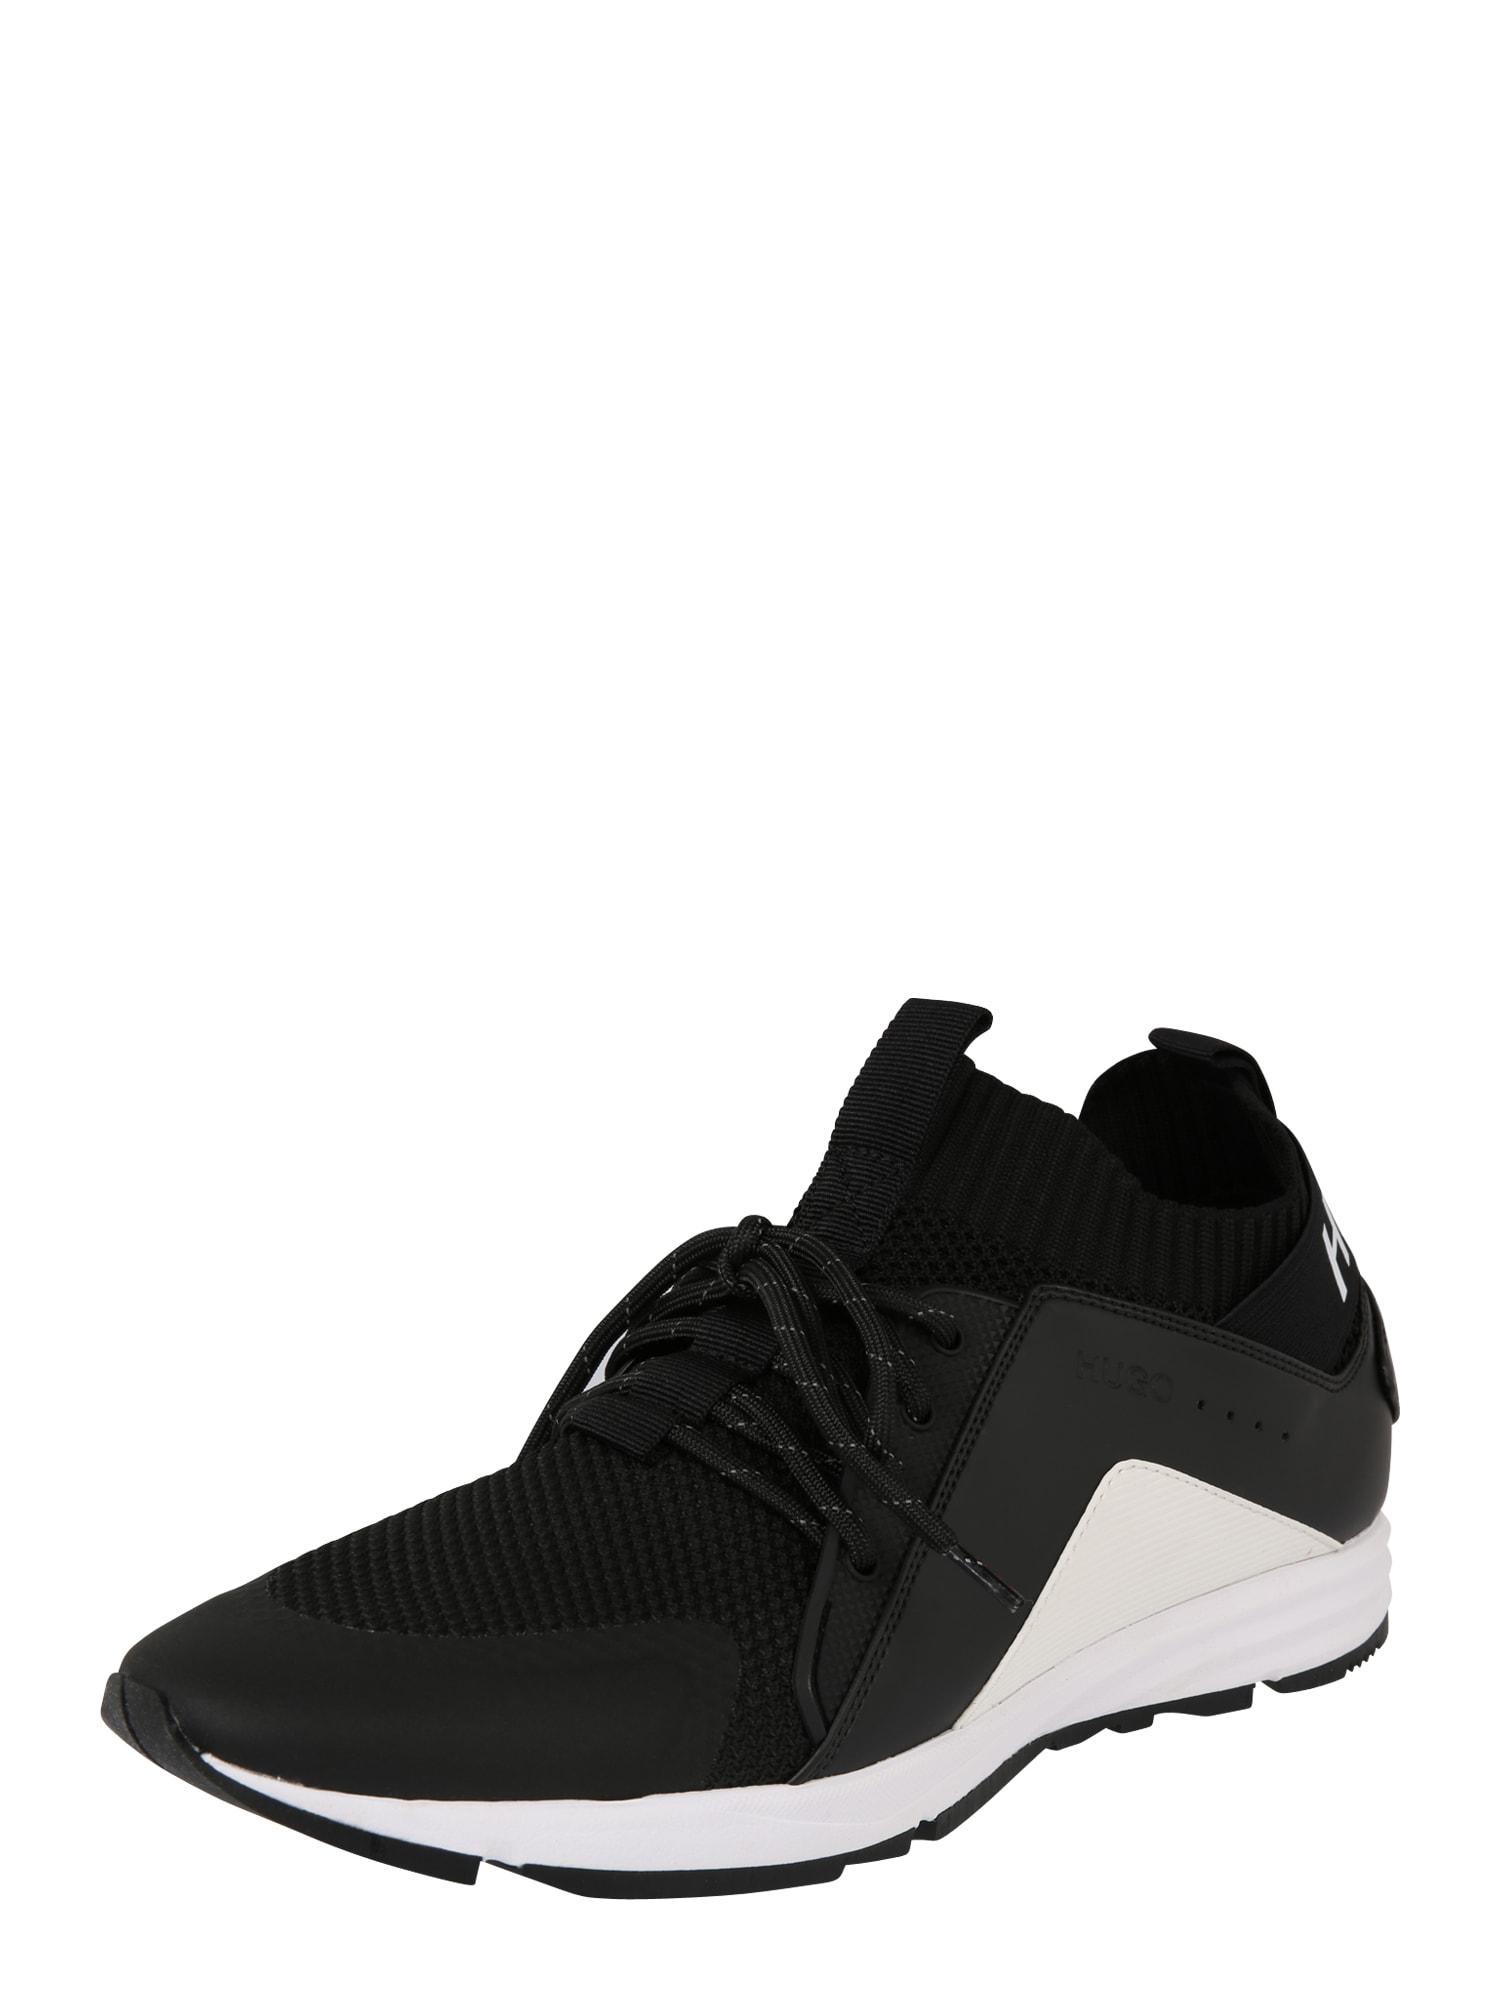 Tenisky Hybrid_Runn_knmx černá bílá HUGO